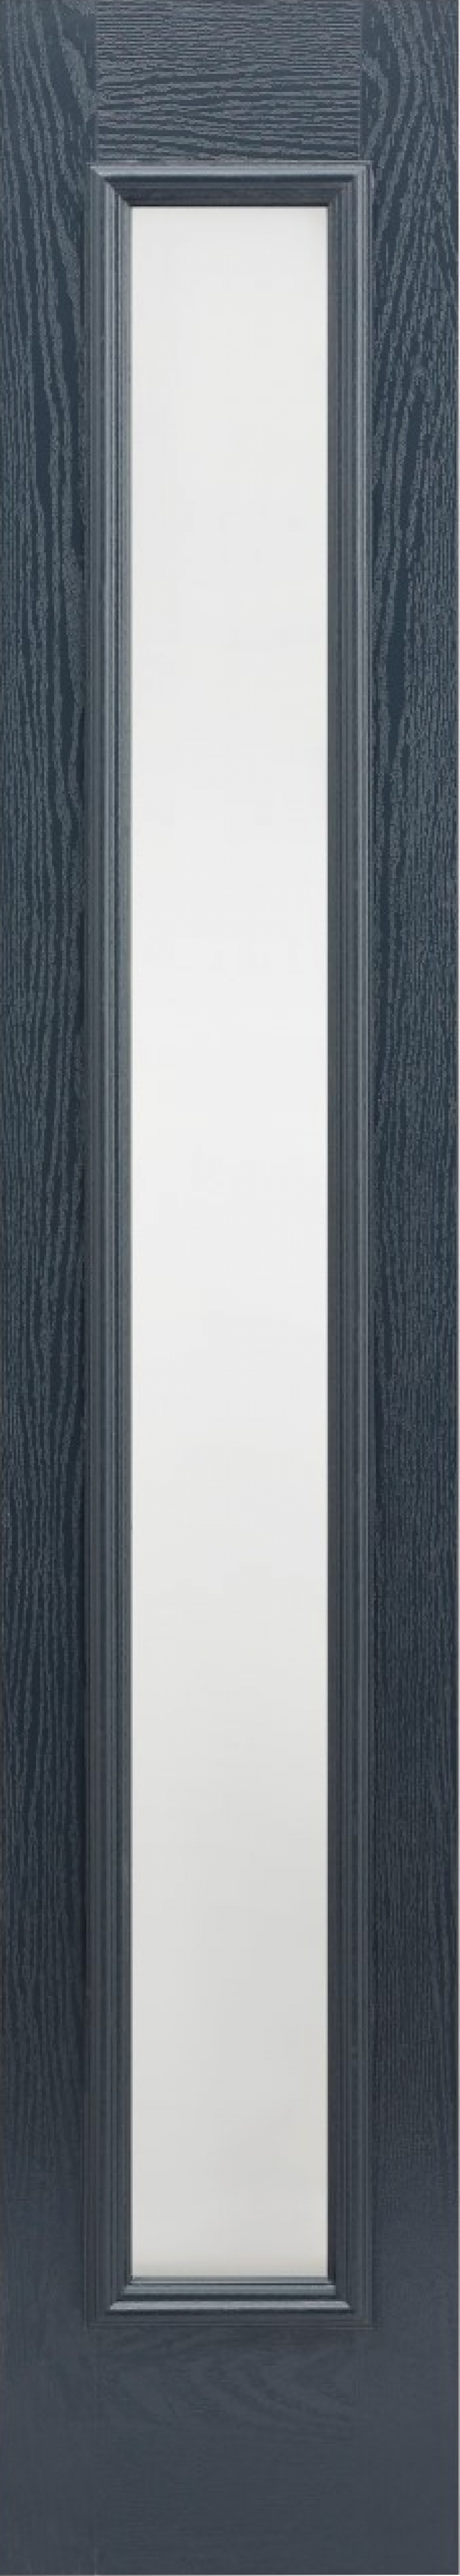 Black Frosted Glazed Composite Sidelight